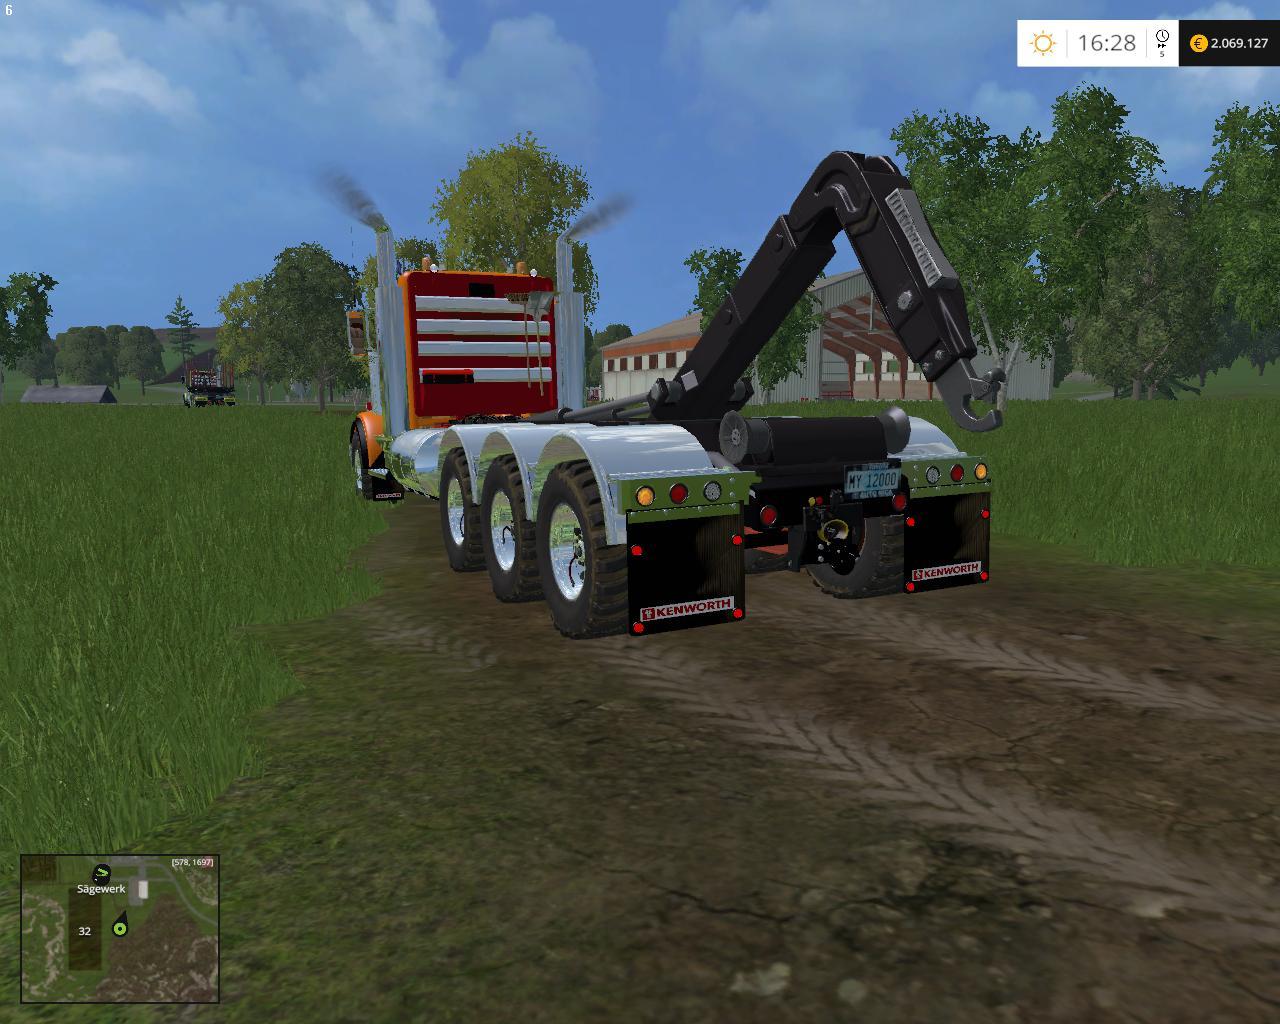 KENWORTH 900B MULTILIF V1 1 • Farming simulator 19, 17, 15